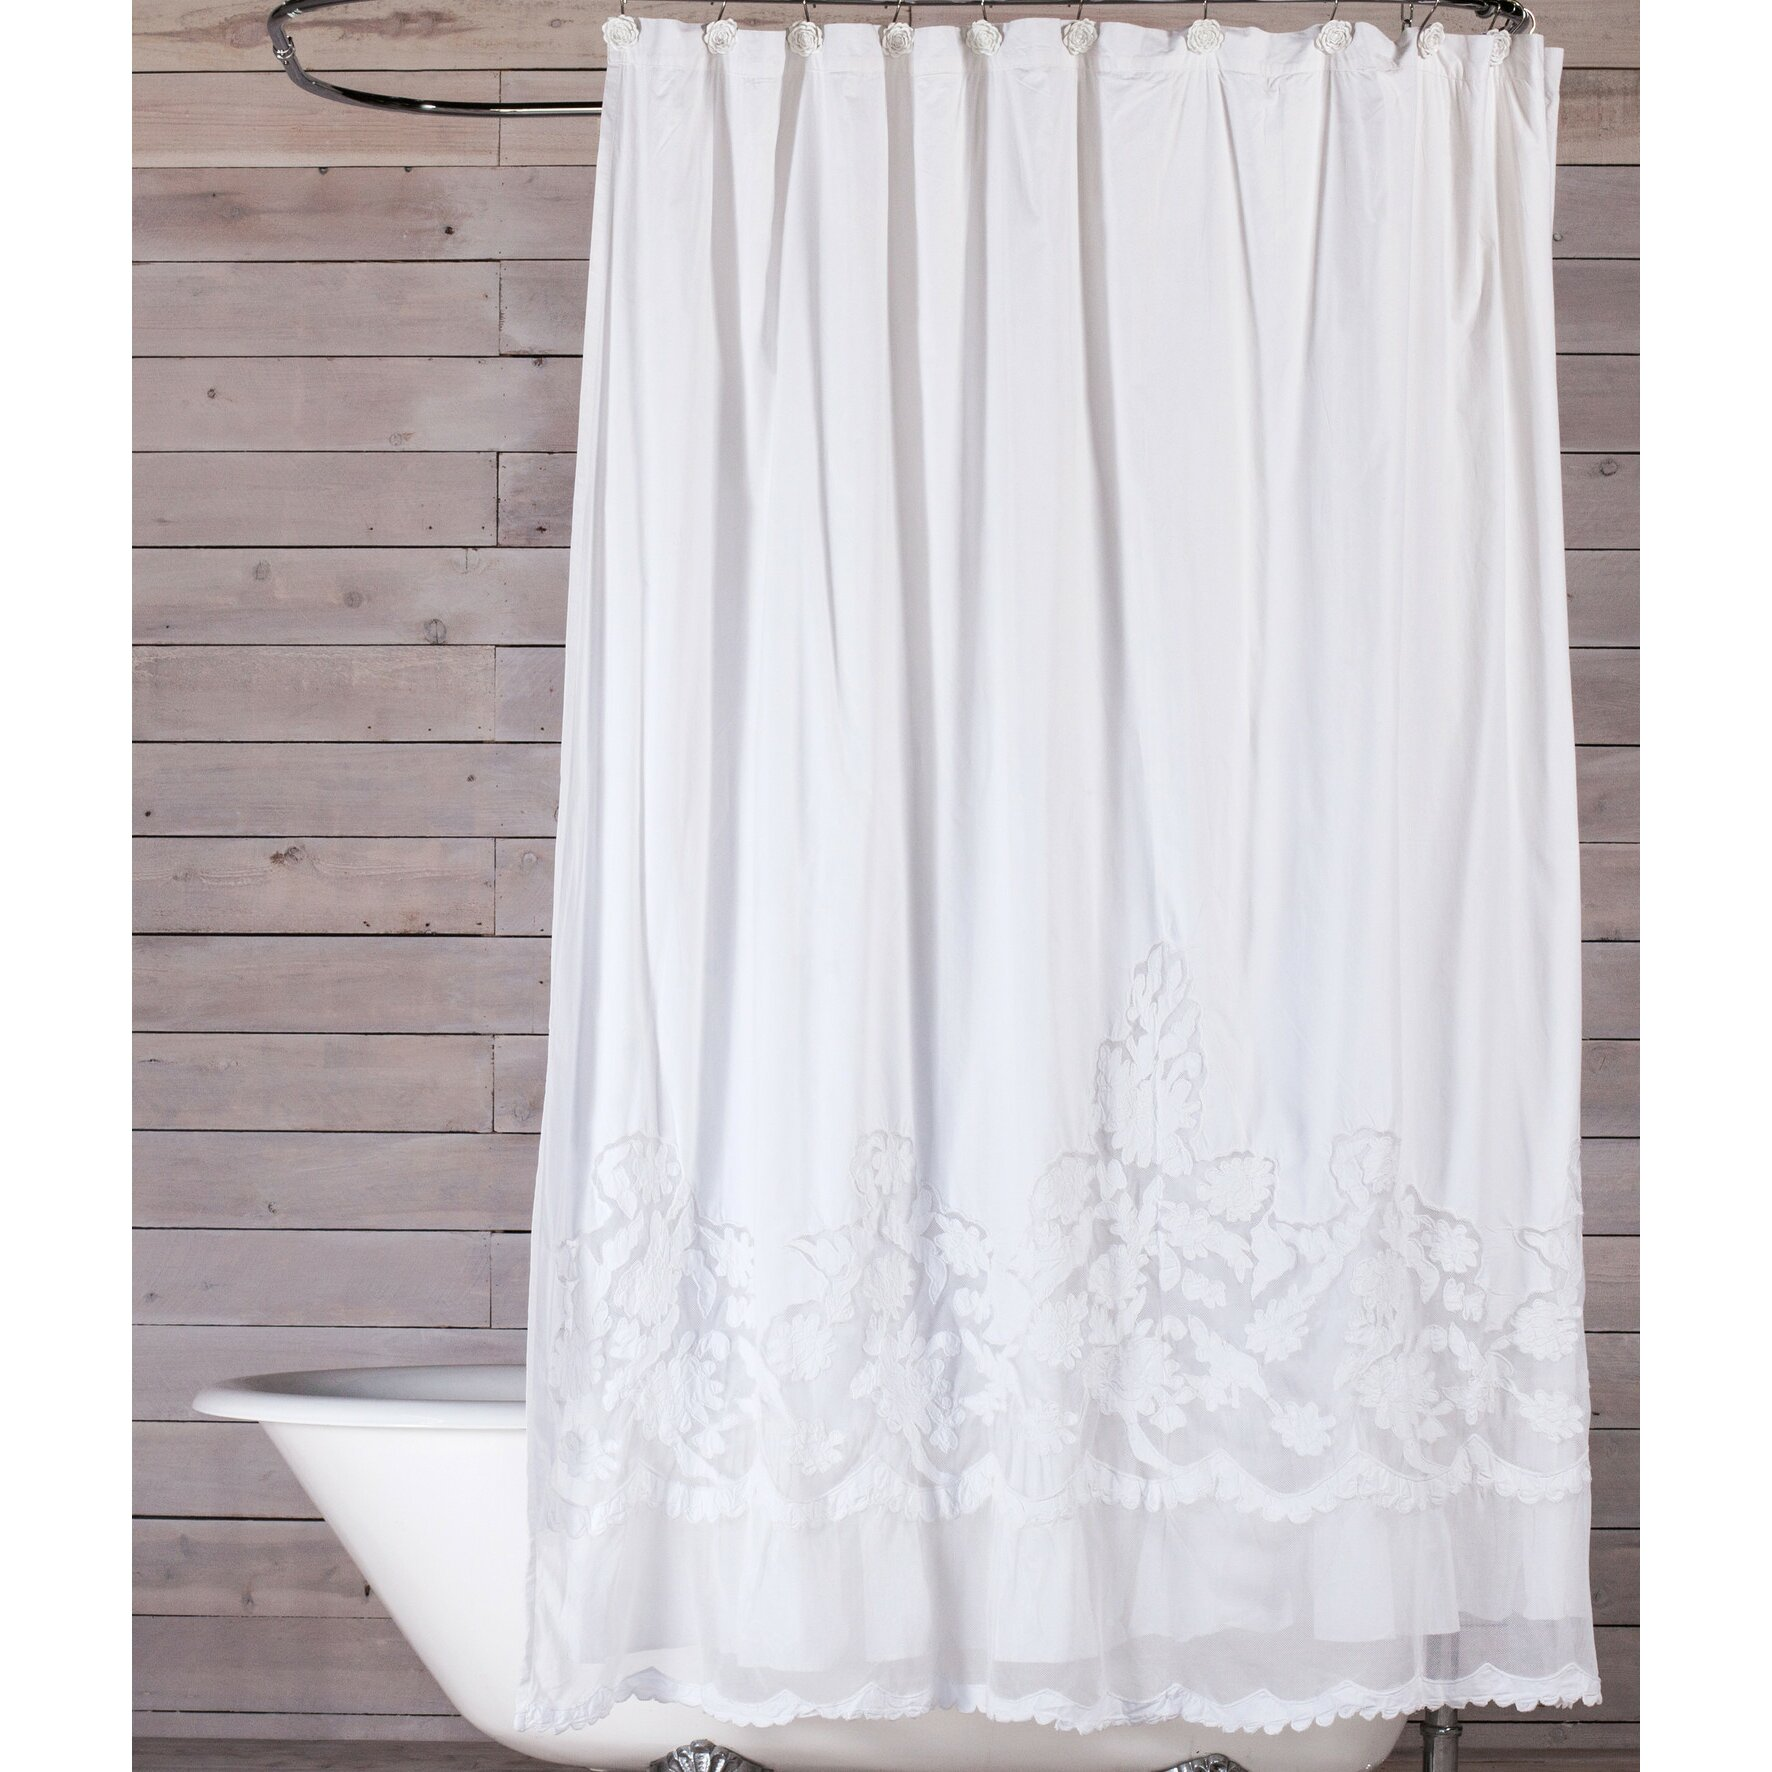 Pom Pom At Home Caprice Cotton Shower Curtain  Reviews Wayfair - Shower curtain